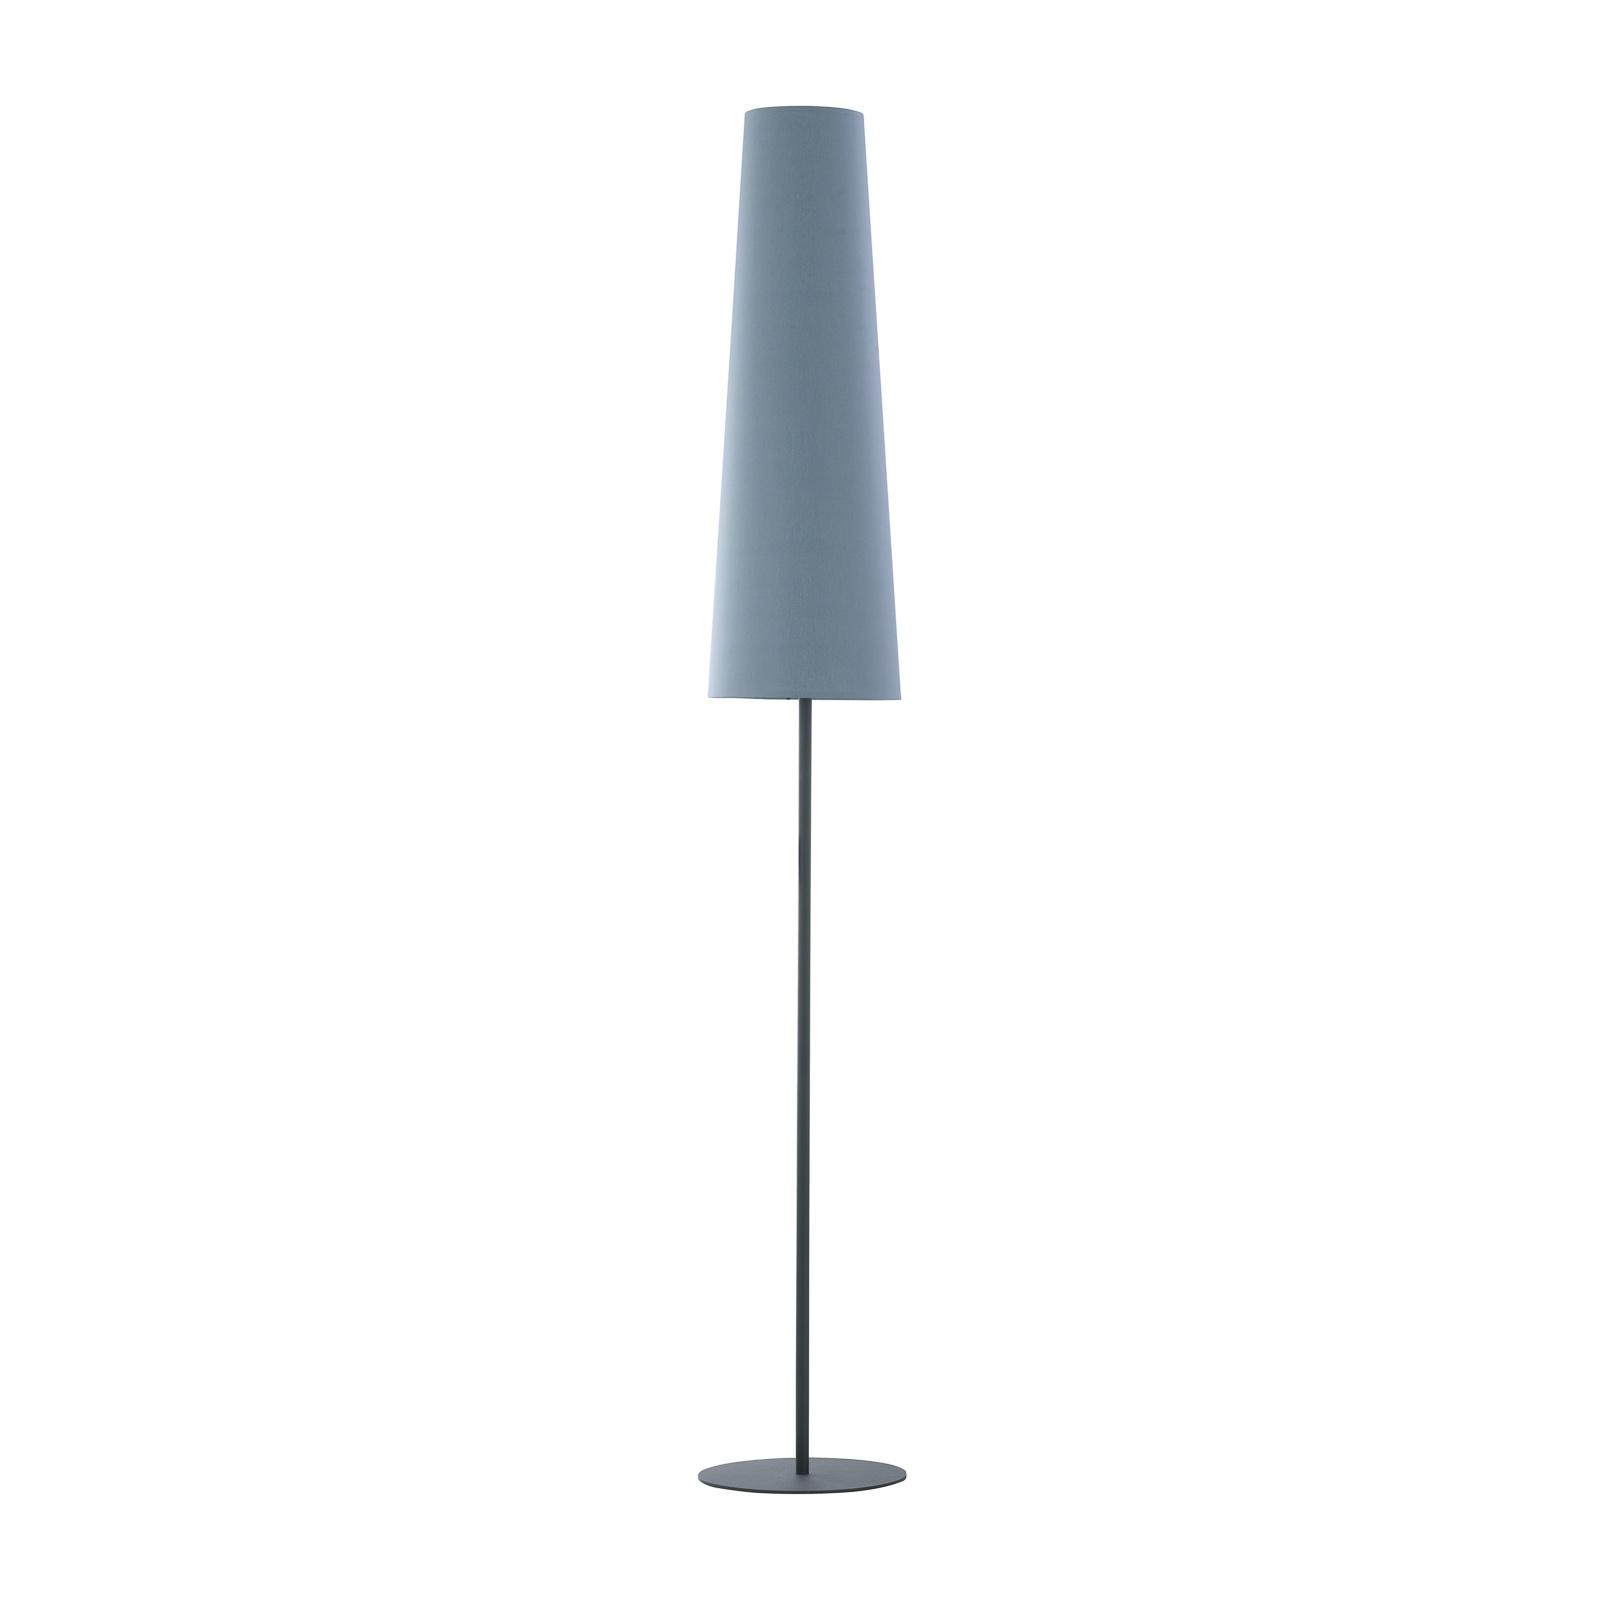 Gulvlampe Umbrella, høyde 168 cm, blå